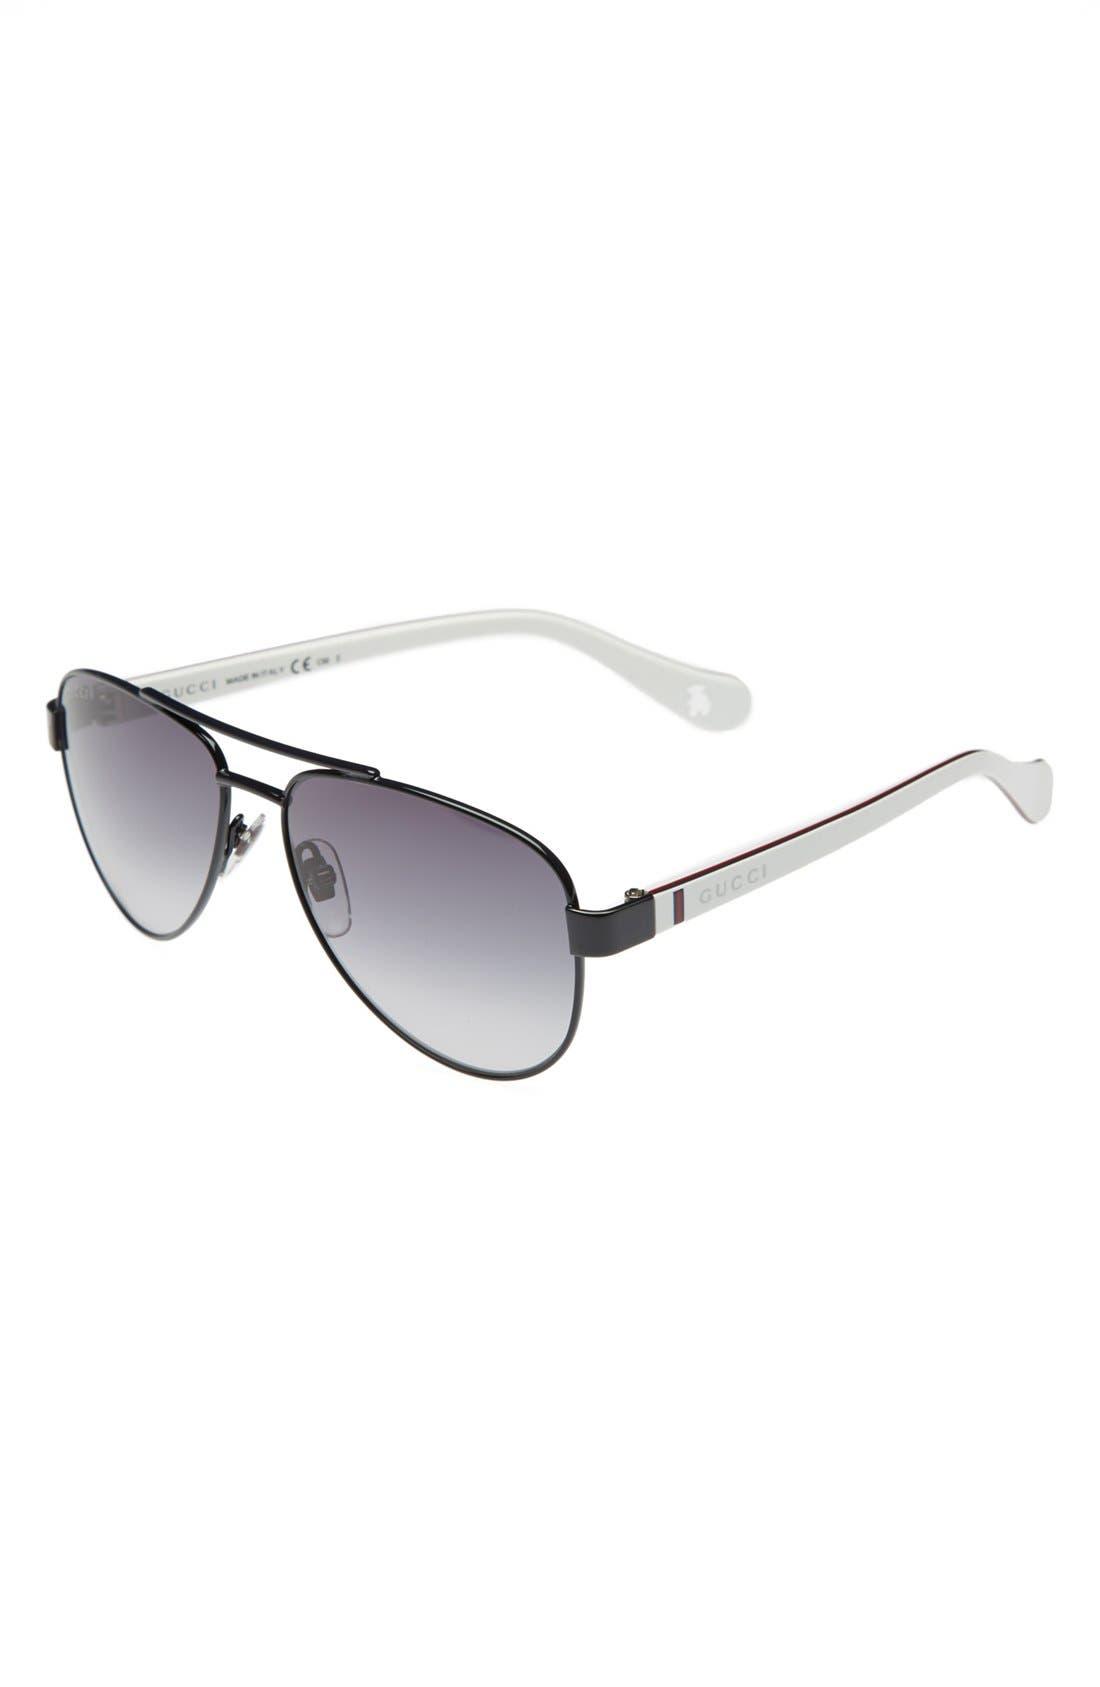 Alternate Image 1 Selected - Gucci 51mm Aviator Sunglasses (Kids)